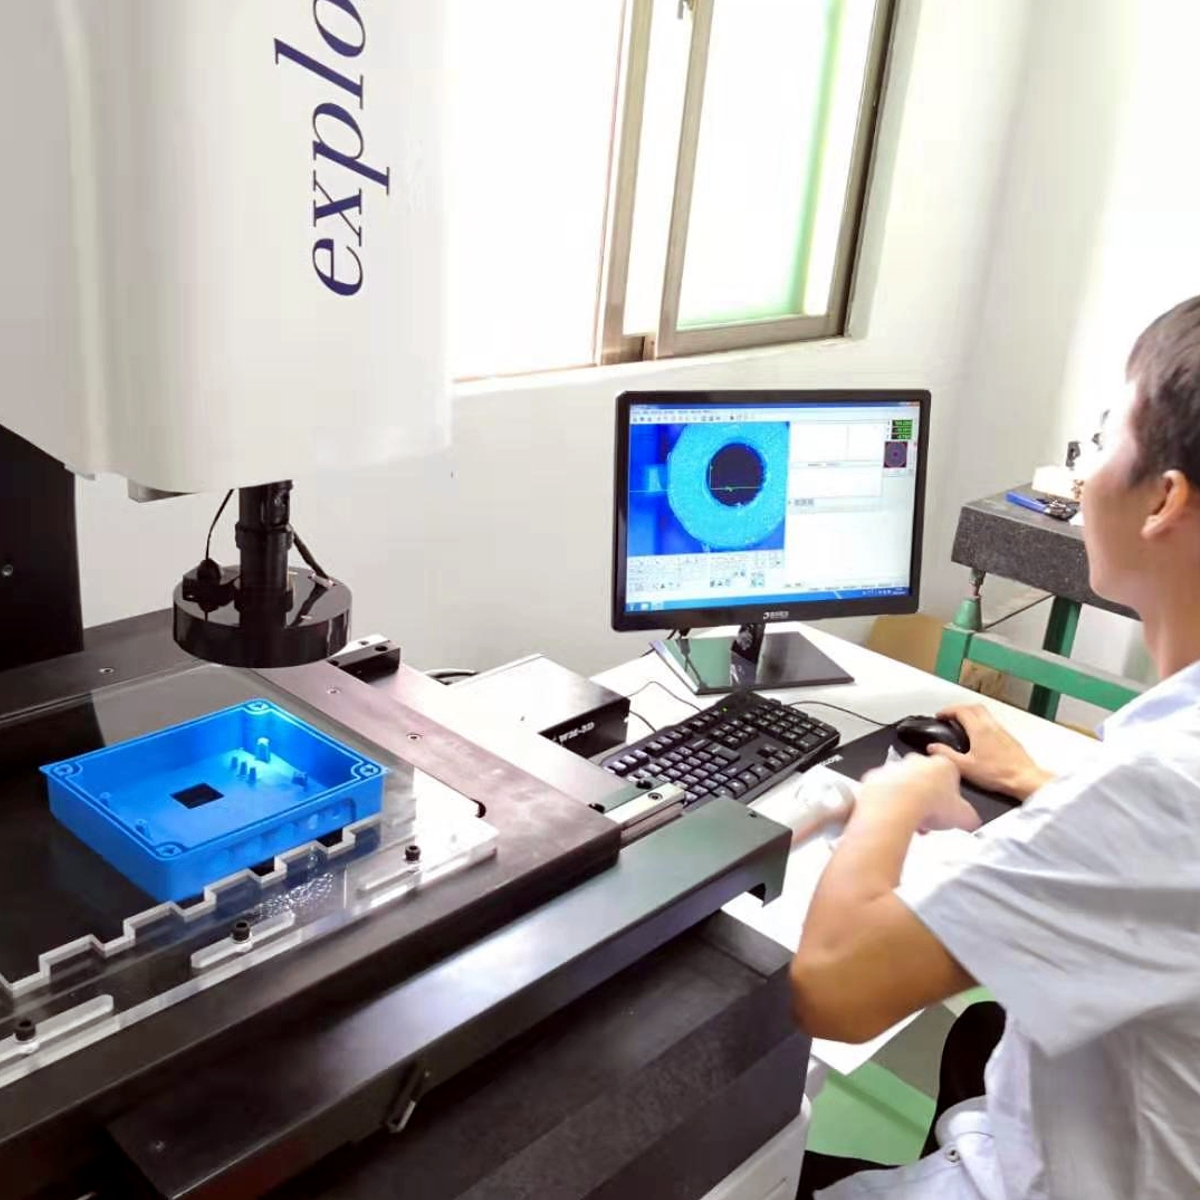 Kwaliteitscontrole bij productie in China